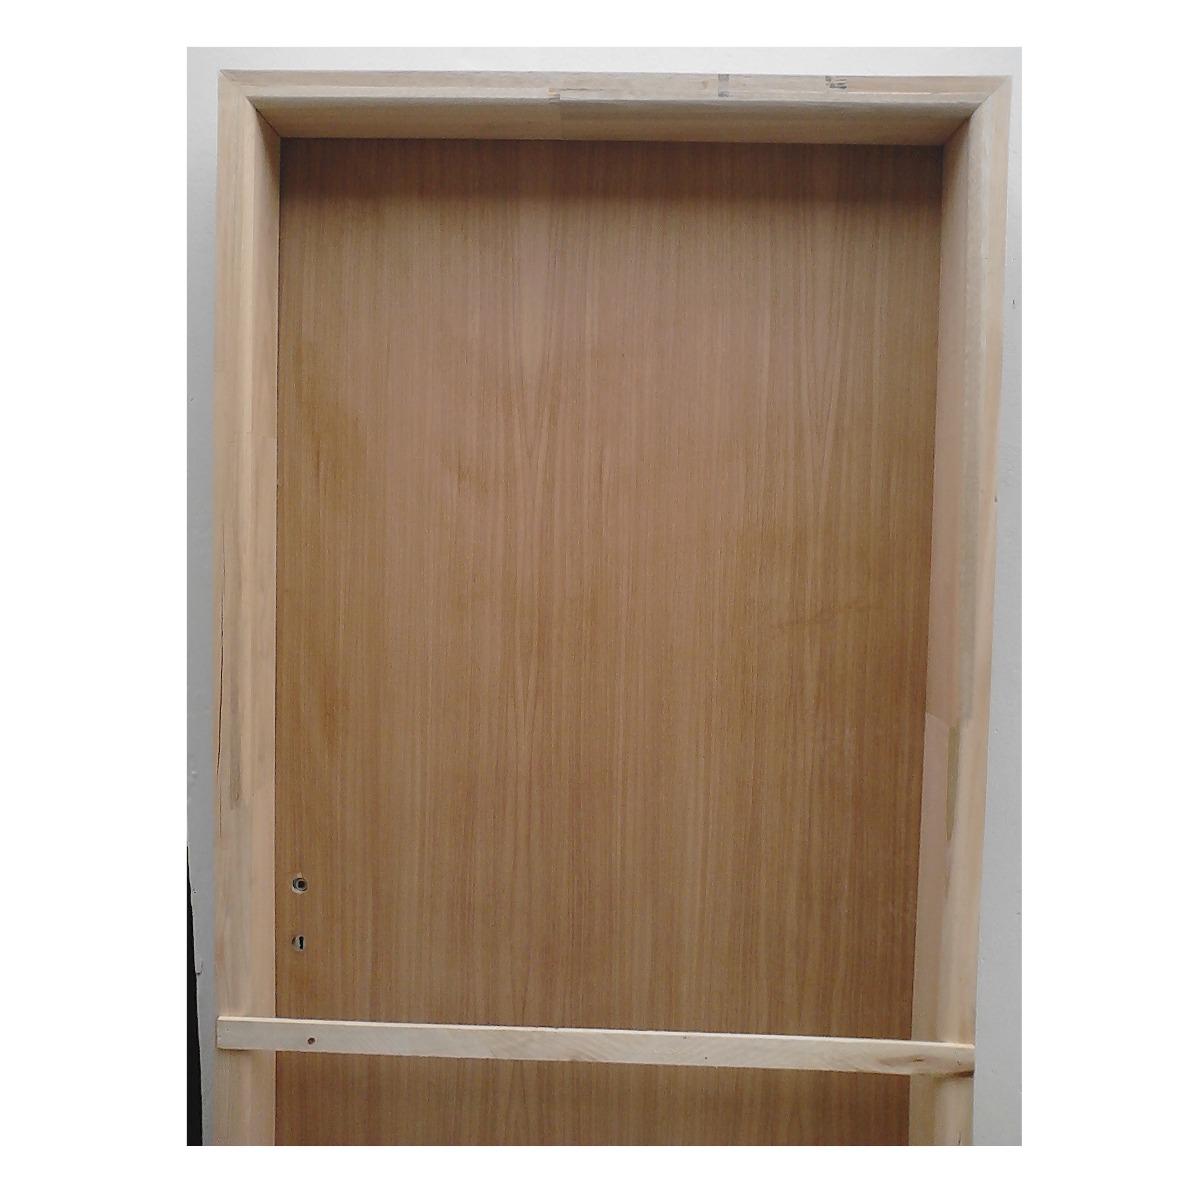 Marco puerta madera beautiful marco puerta madera with for Marco puerta madera